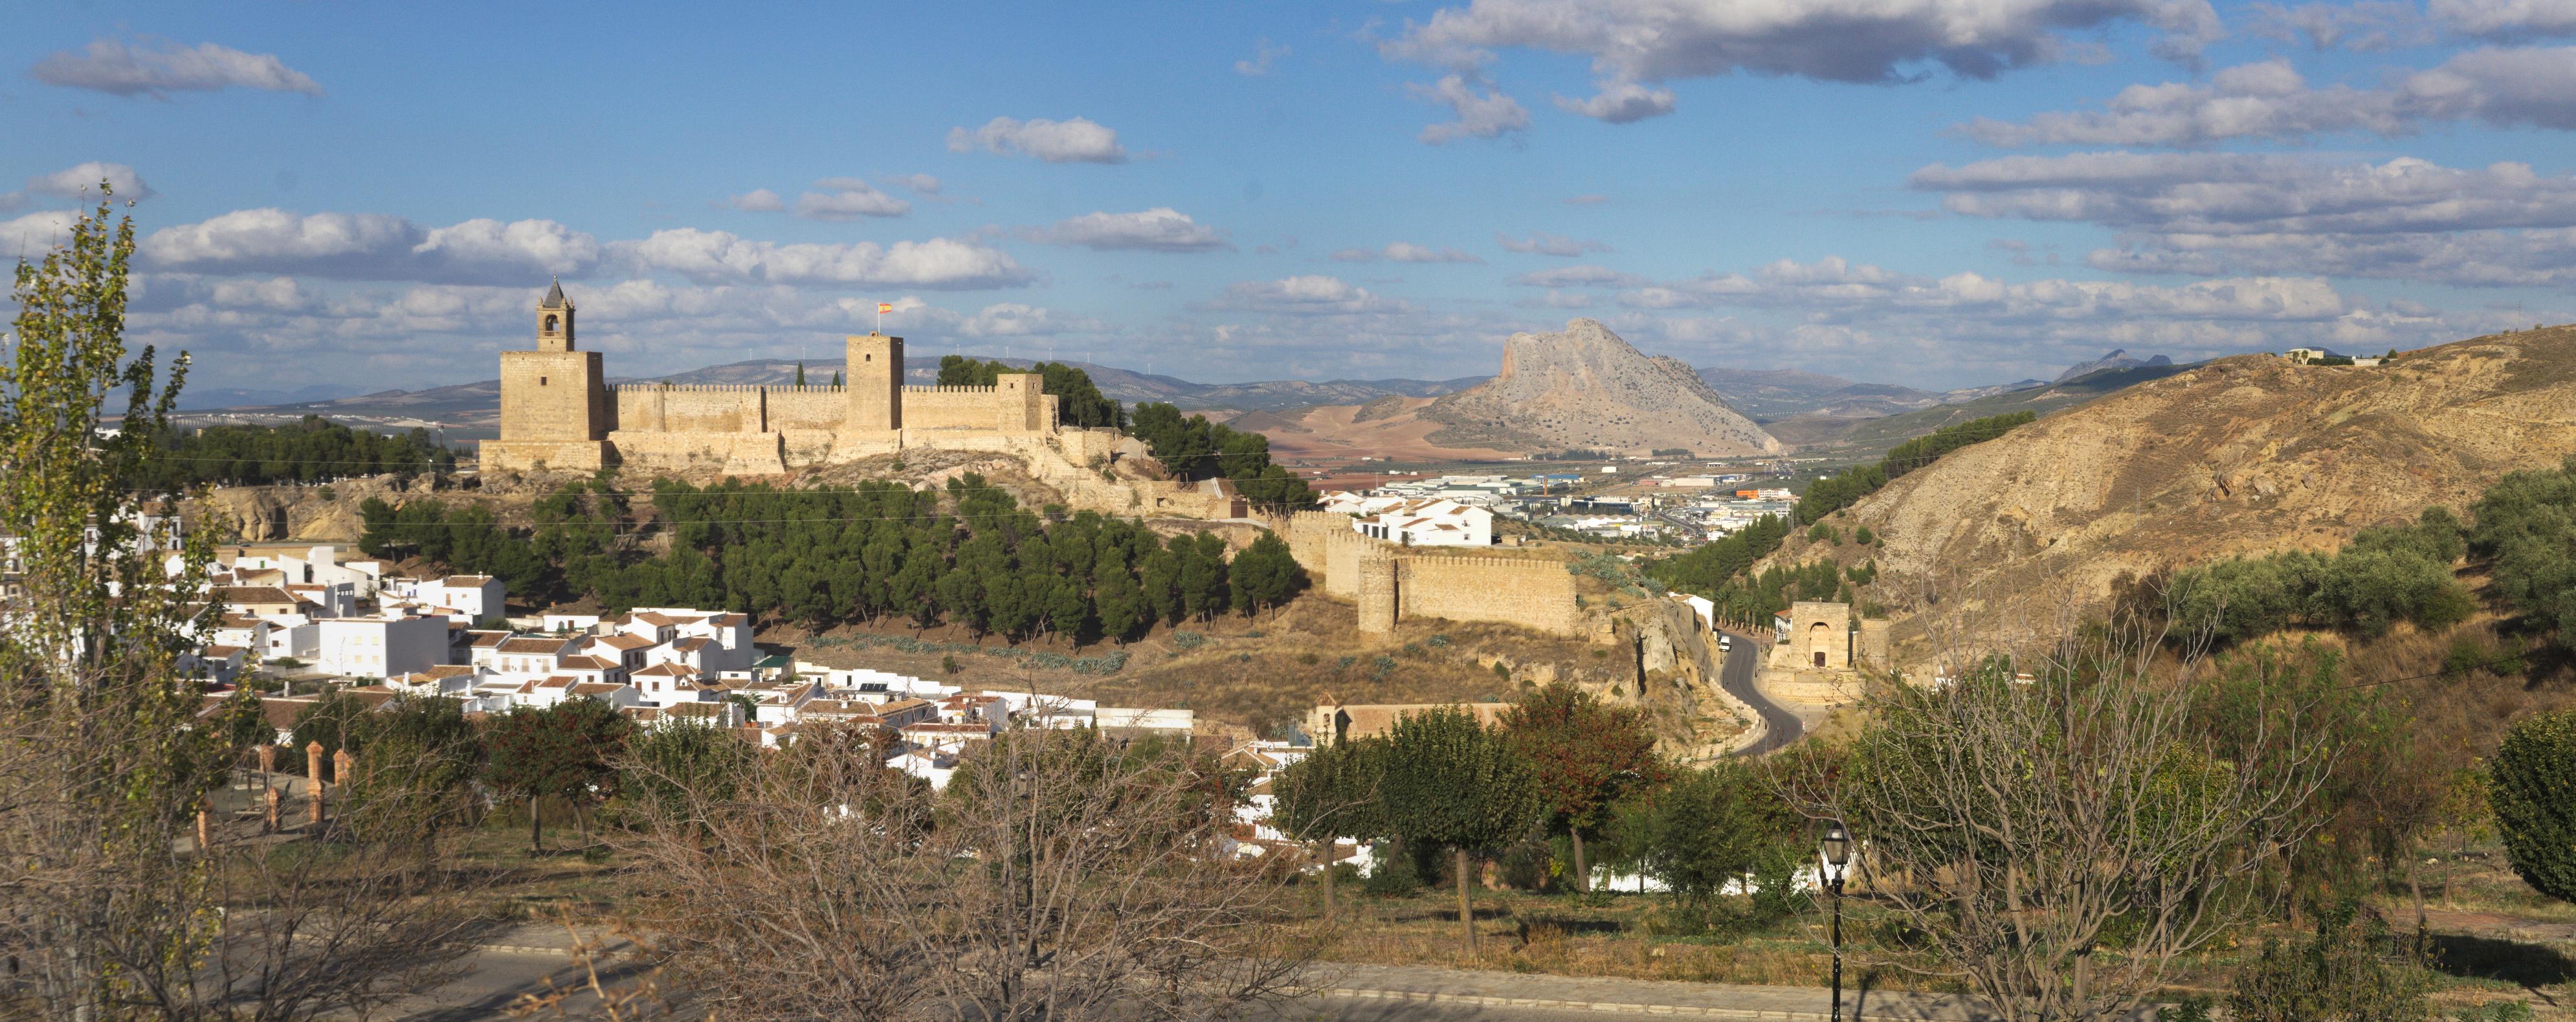 Alcazaba de Antequera - Wikipedia, la enciclopedia libre